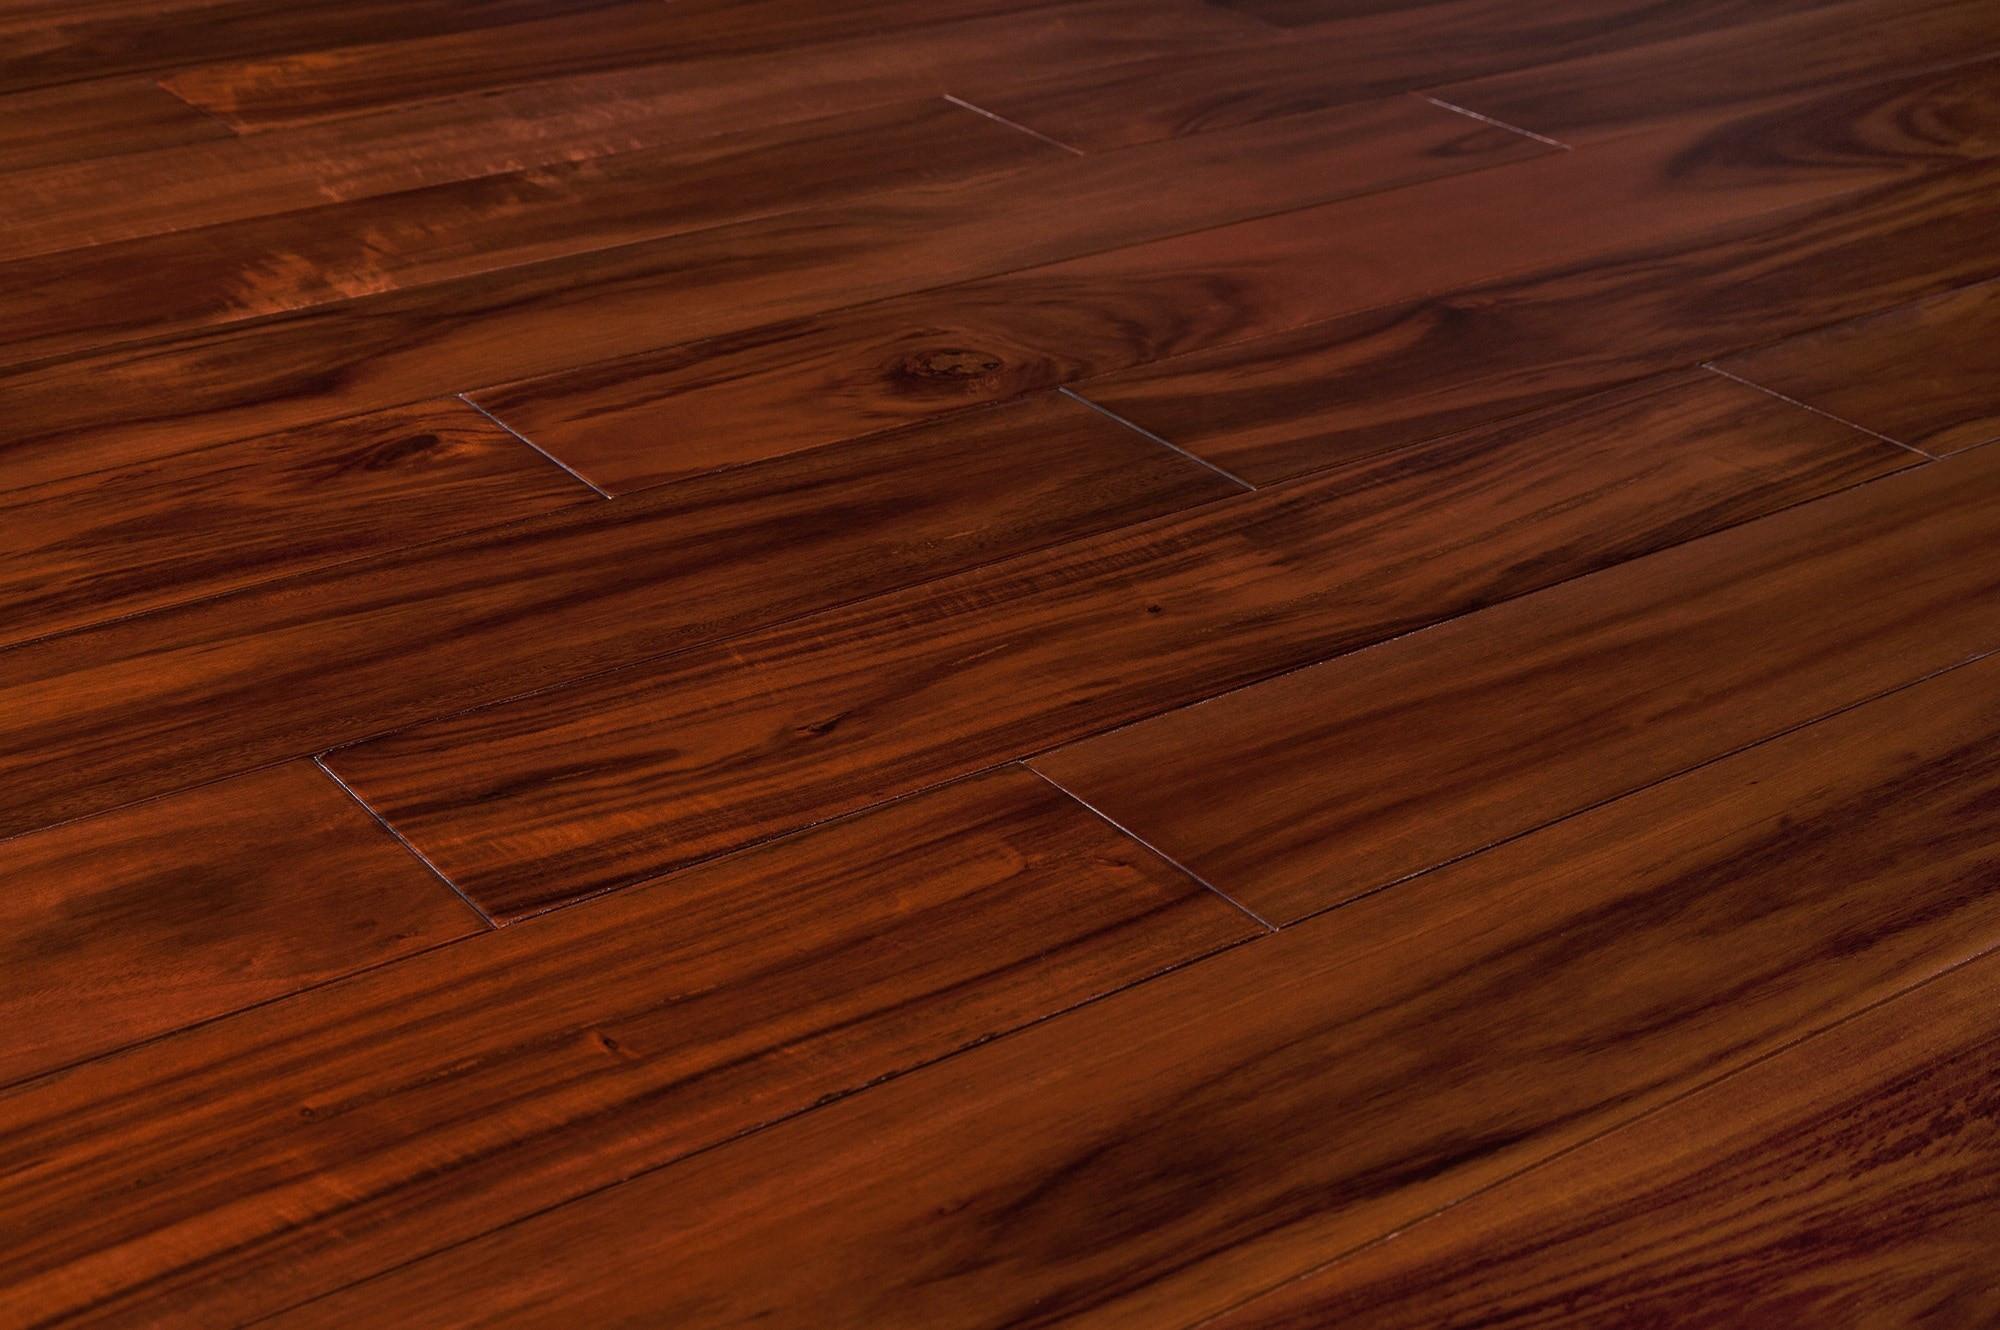 2 1 4 maple hardwood flooring unfinished of 14 unique acacia solid hardwood flooring pics dizpos com throughout acacia solid hardwood flooring new clearance wood flooring house unique wide plank solid hardwood with photograph